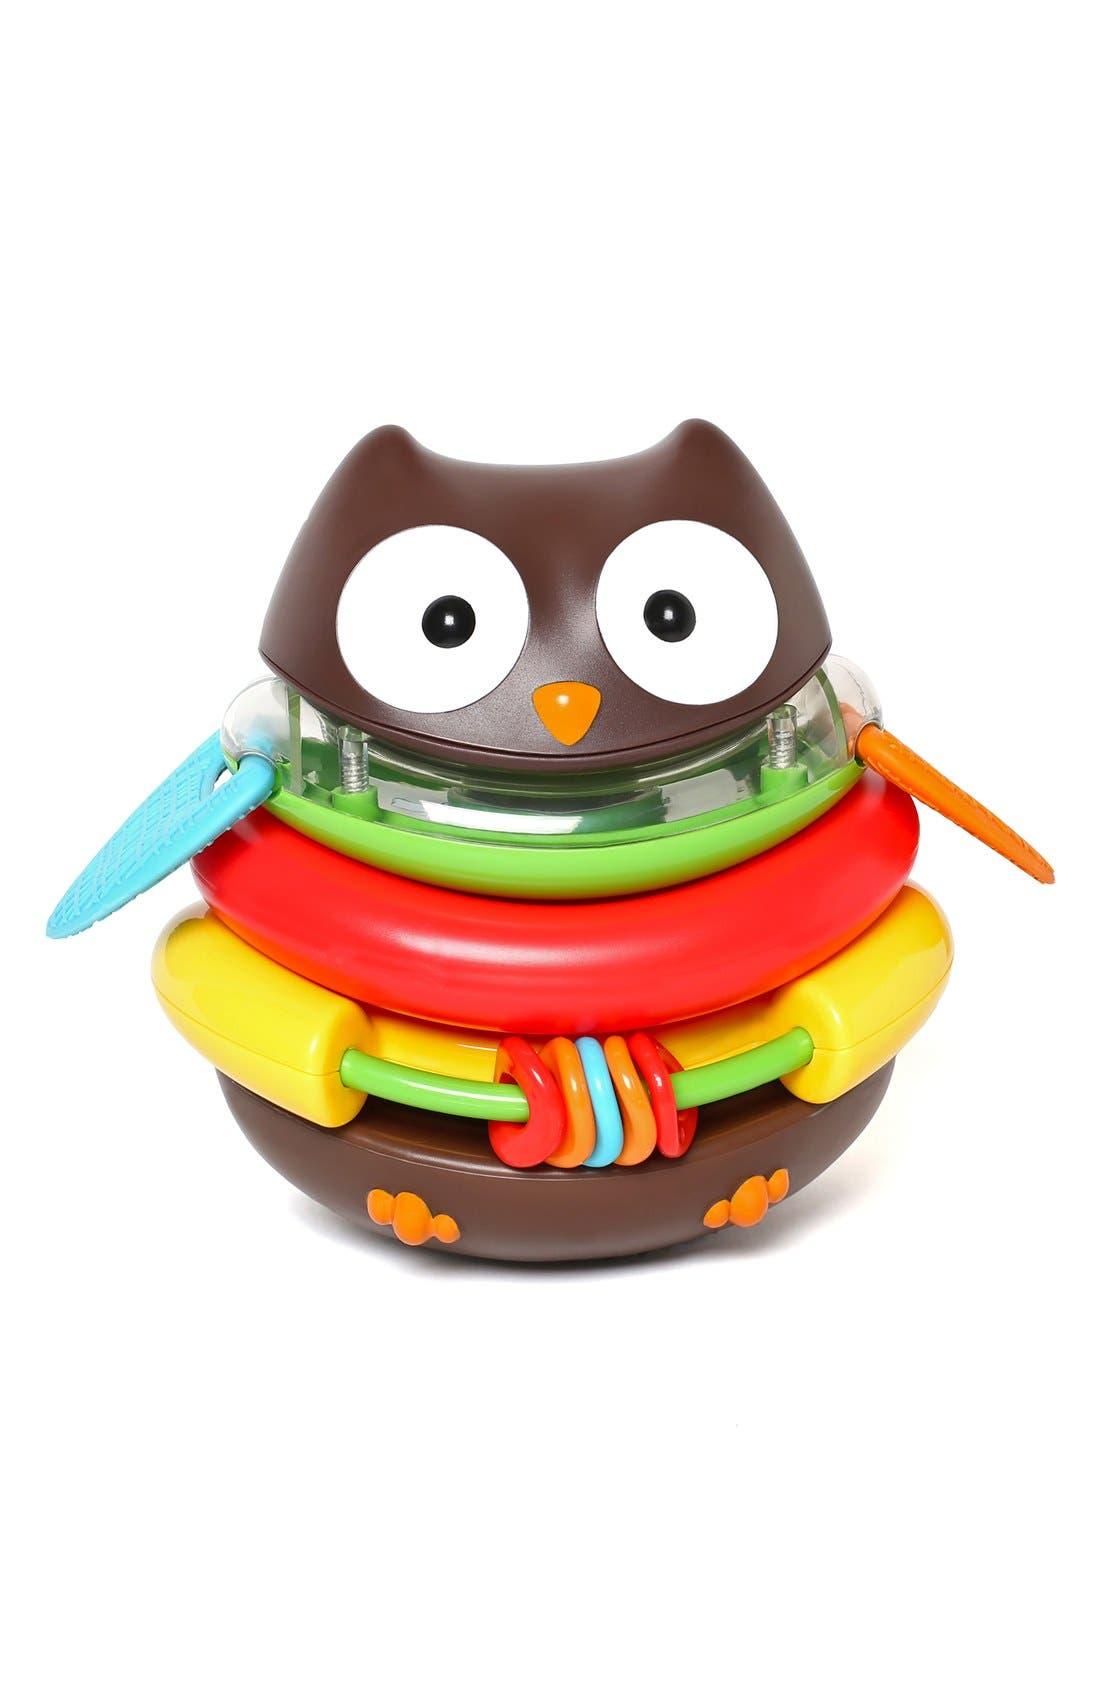 Skip Hop 'Explore & More' Rocking Owl Stacker